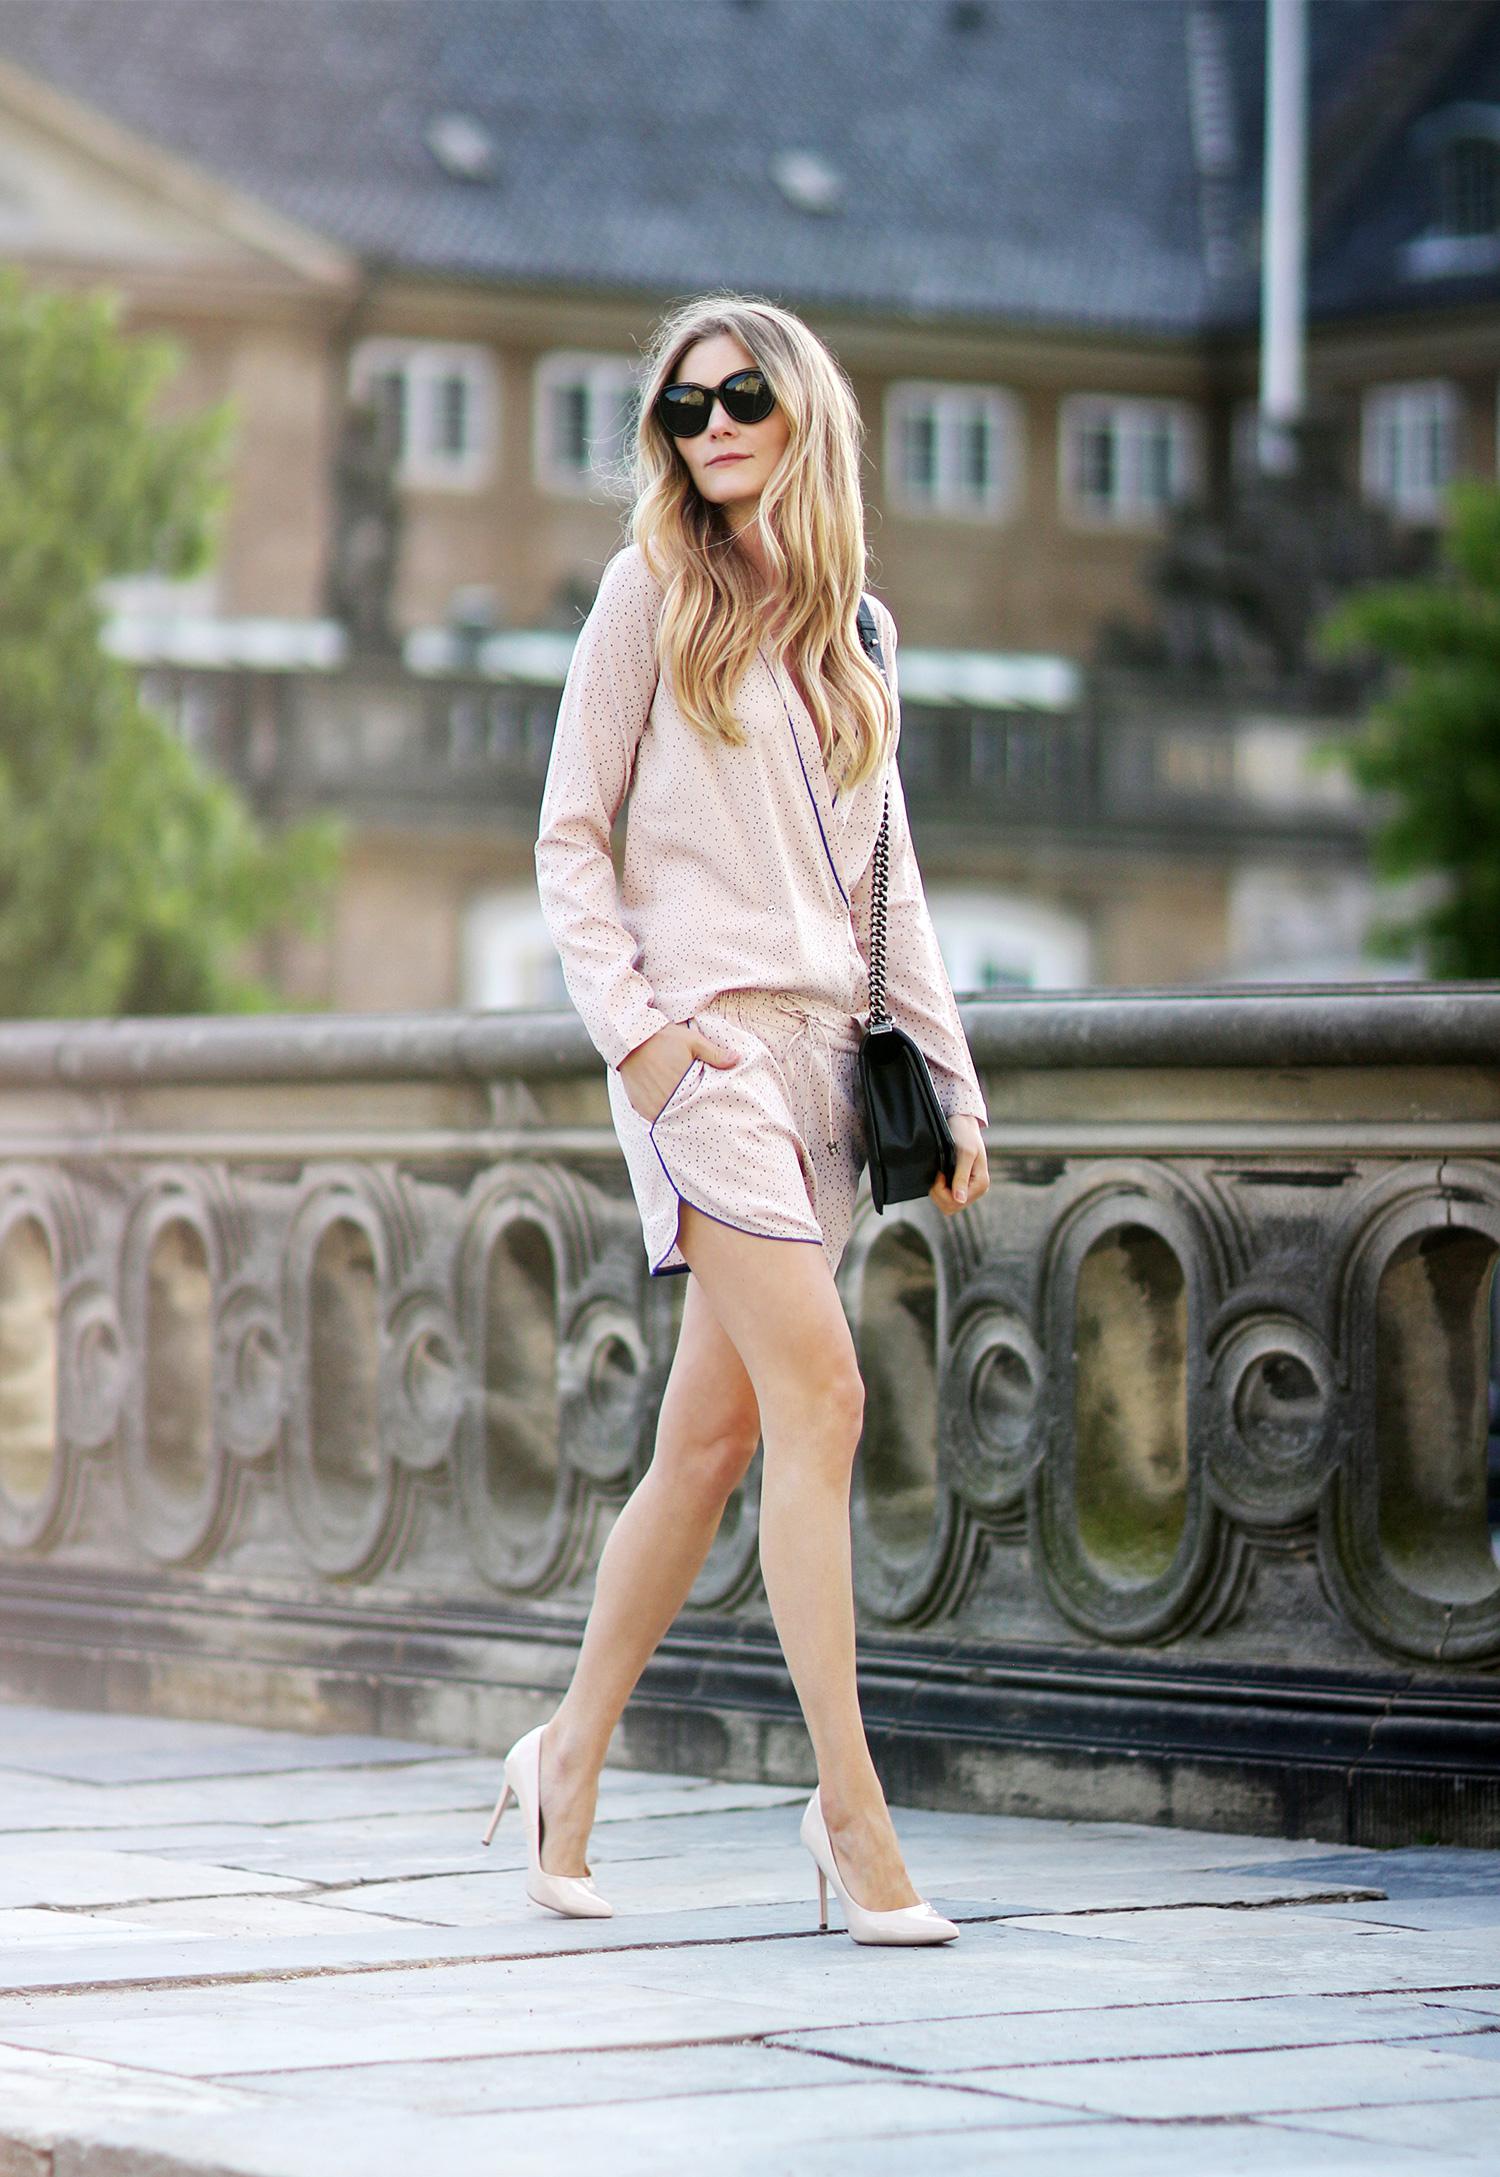 lyserødt-sæt-modeblog-âme-copenhagen-fashion-blog-tøj-shopping@2x